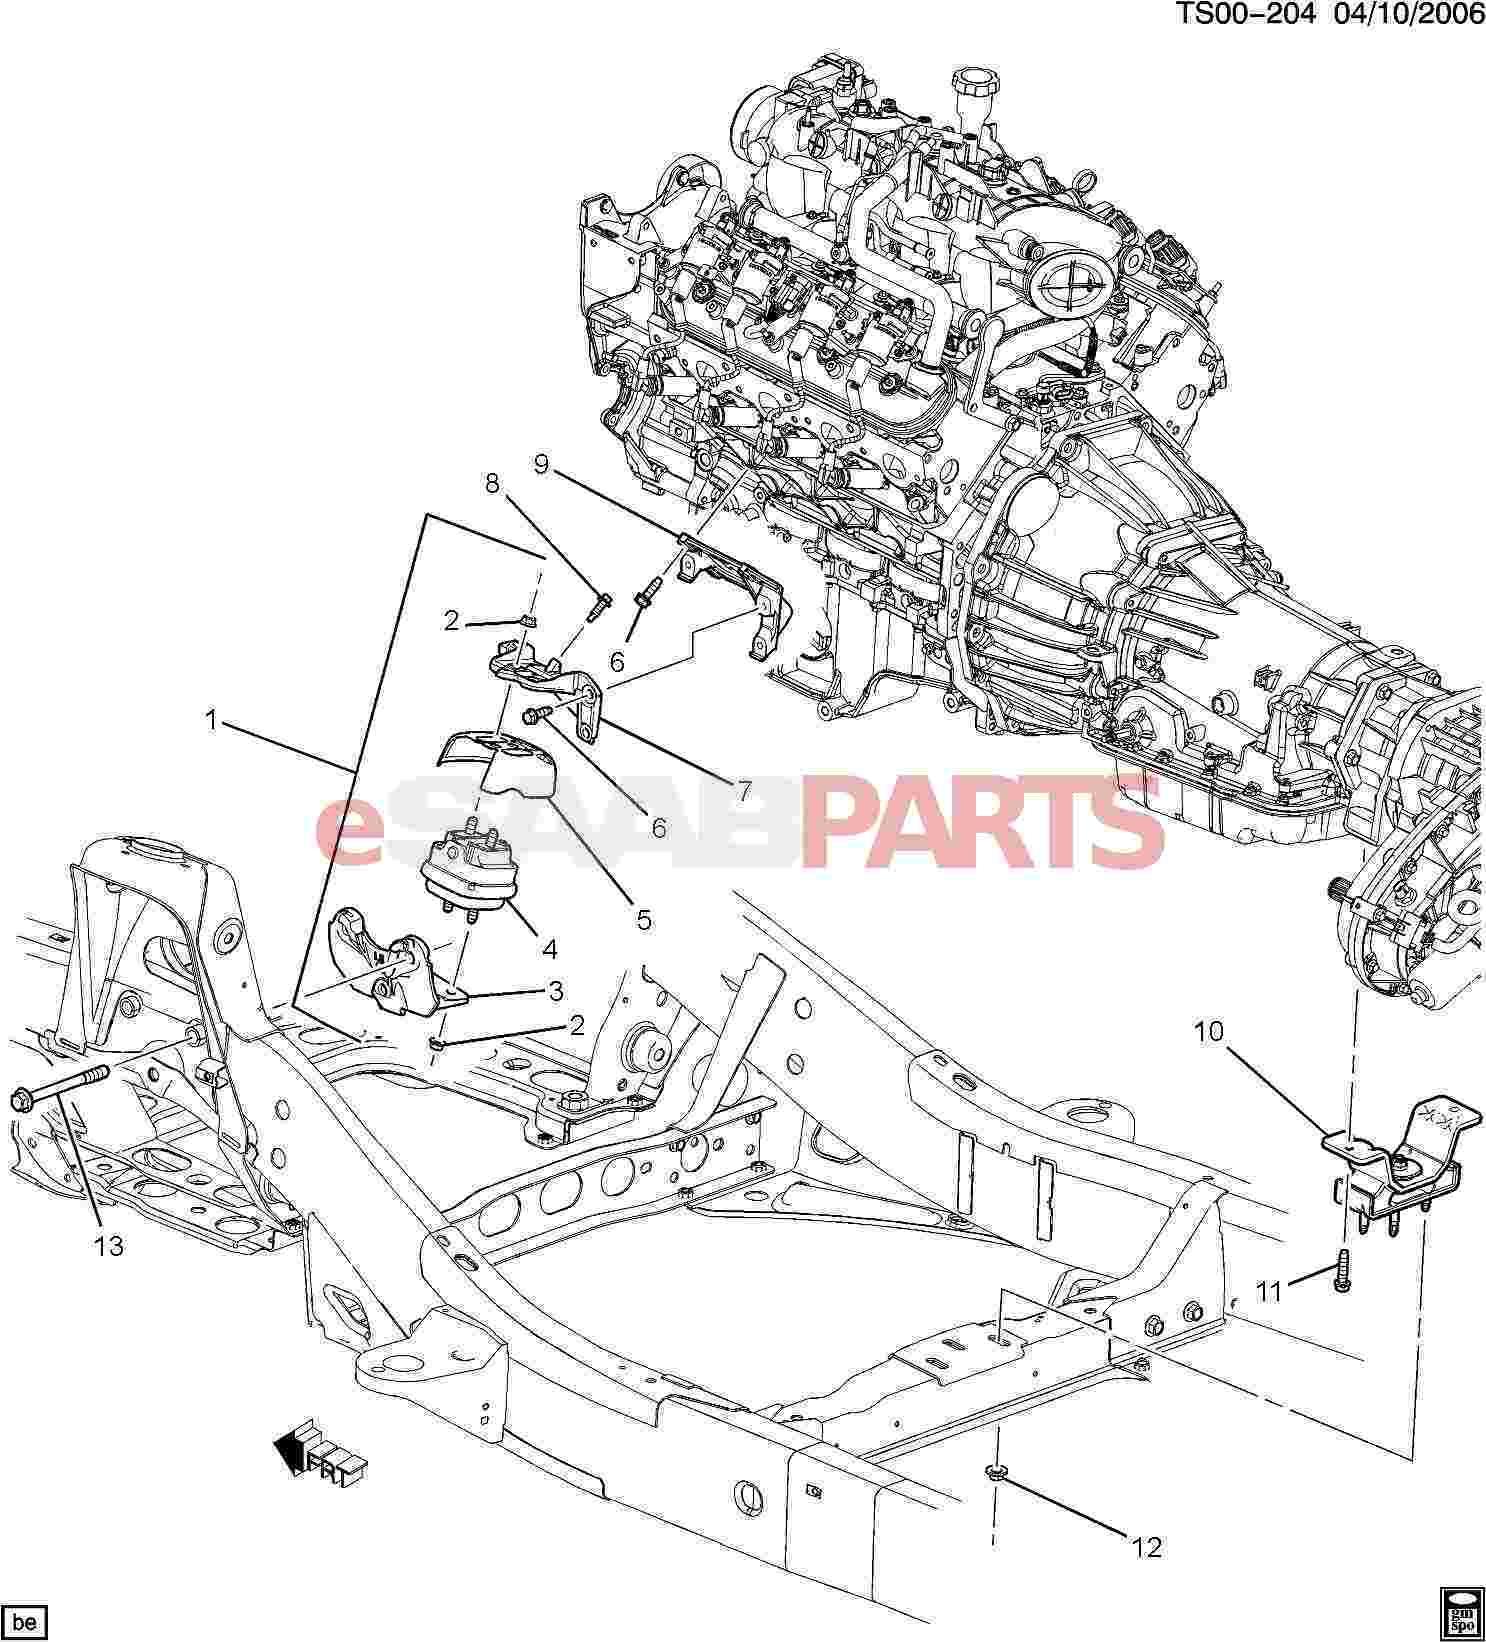 Ej205 Engine Diagram Wiring Will Be A Thing Subaru Ej20 Sh3 Me Code